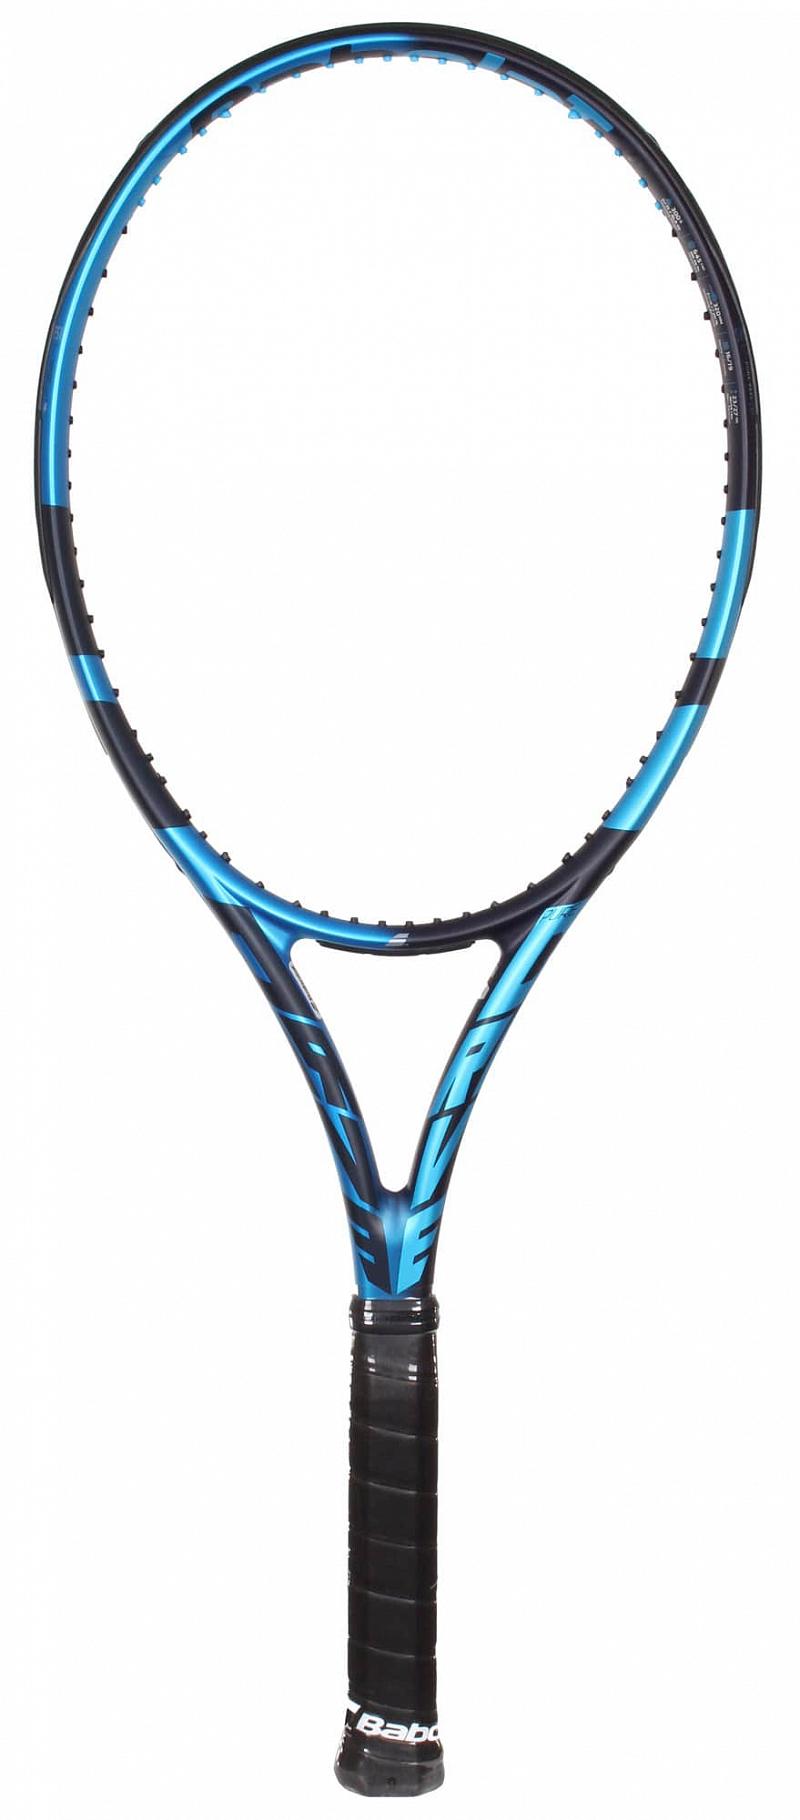 Pure Drive Tour 2021 tenisová raketa grip: G3